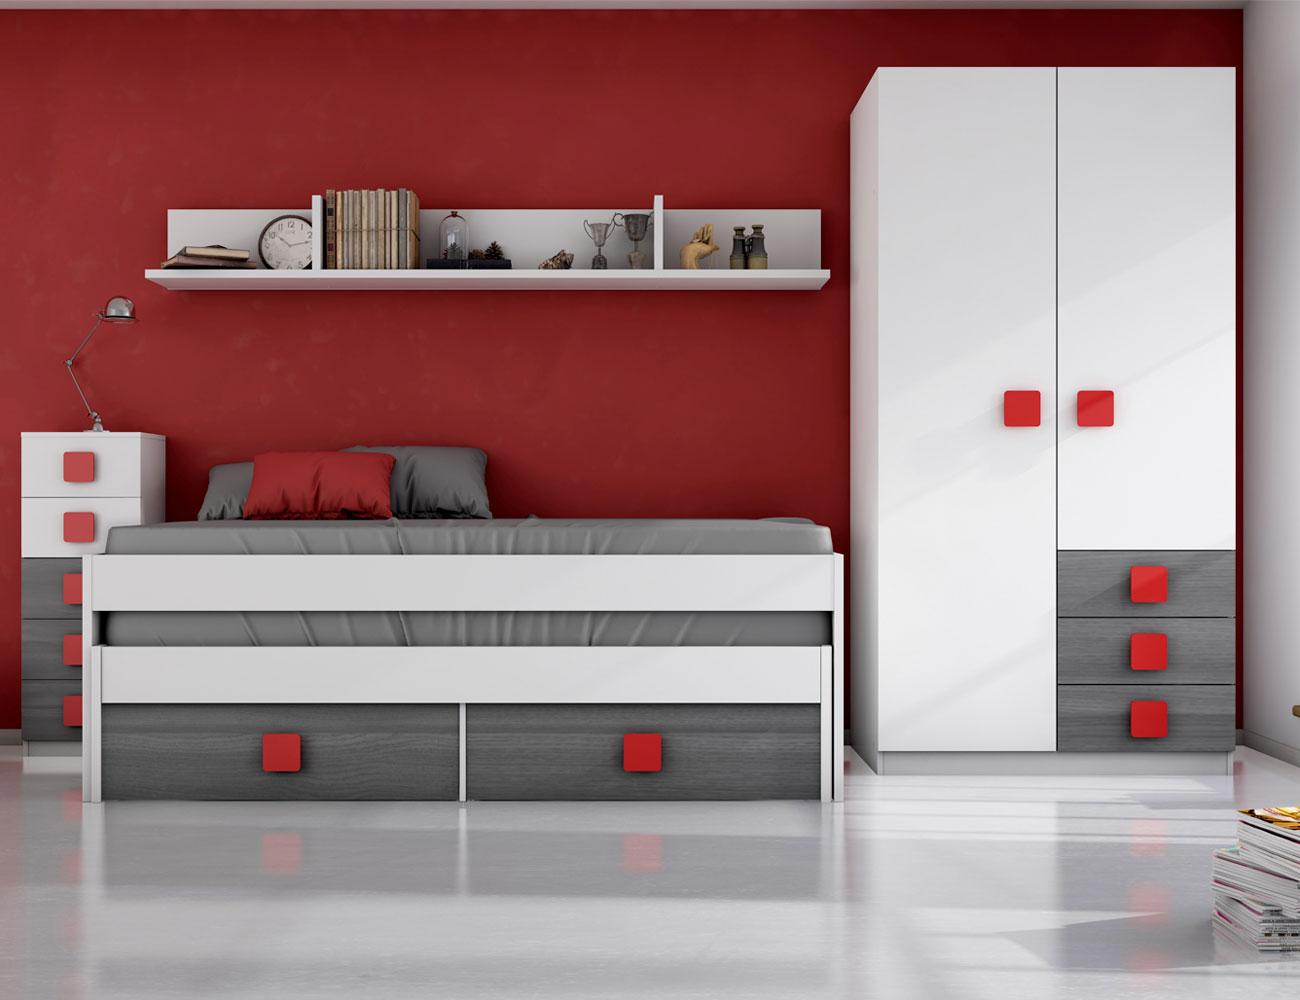 Dormitorio juvenil ceniza rojo3